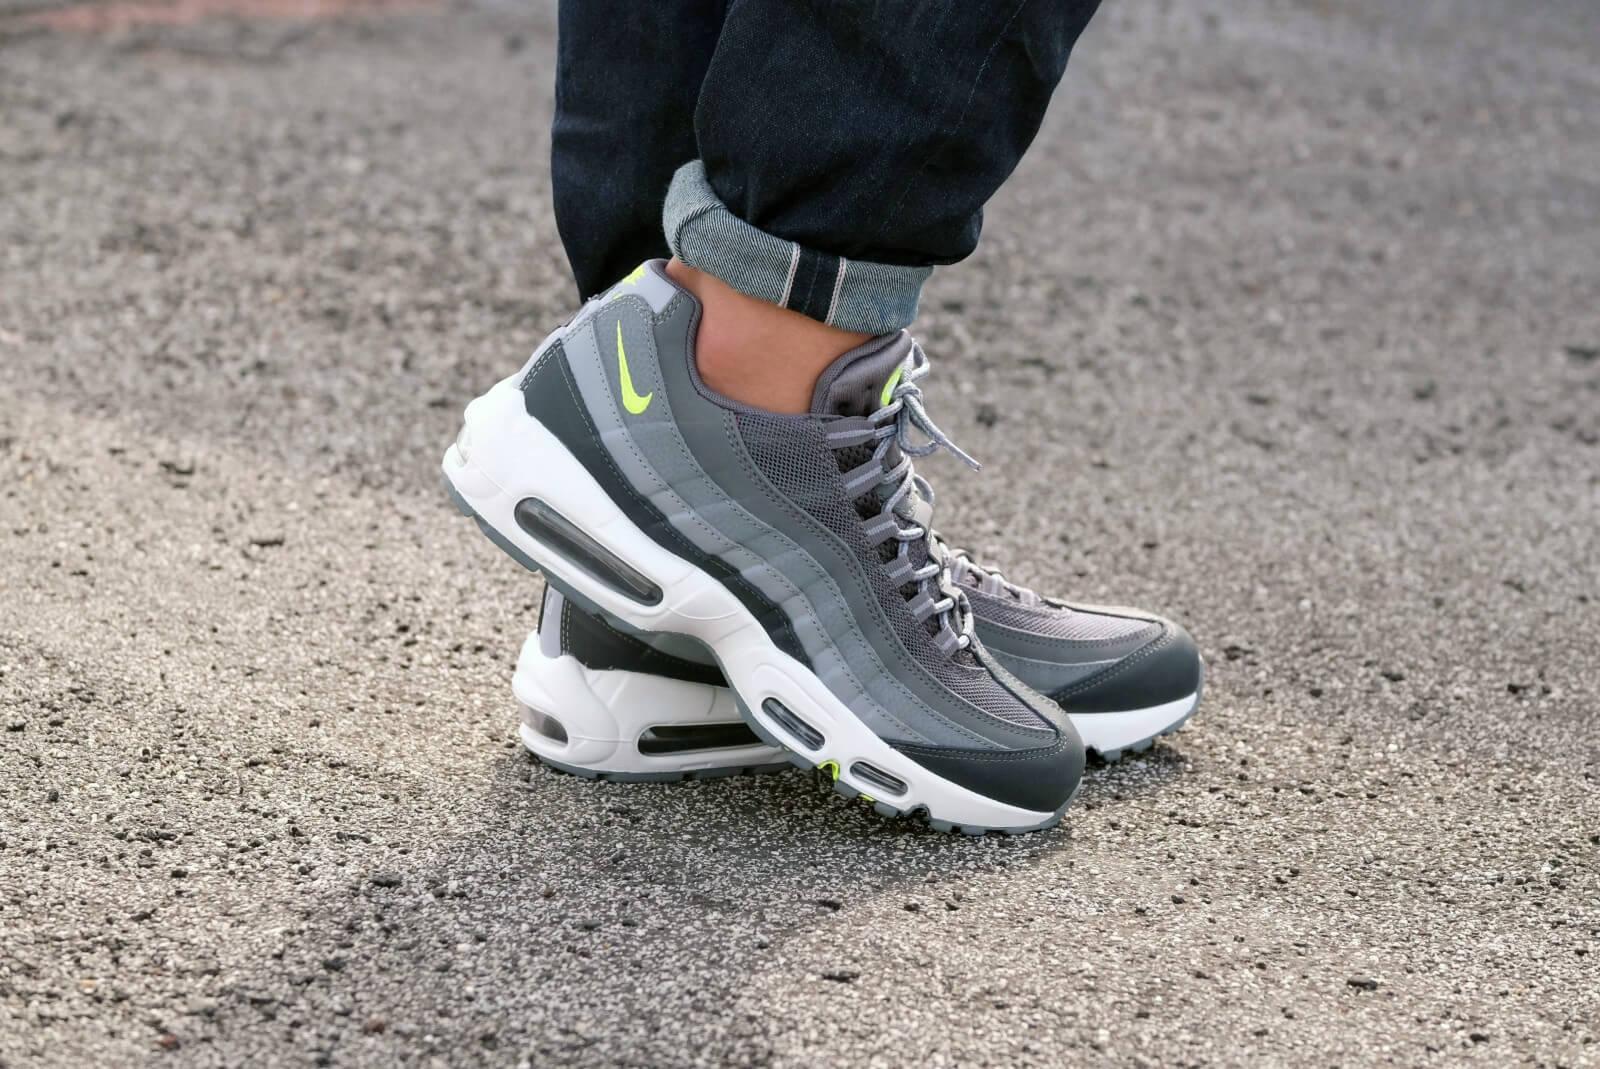 Nike Air Max 95 Essential Anthracite/Volt-Anthracite-Dark Grey